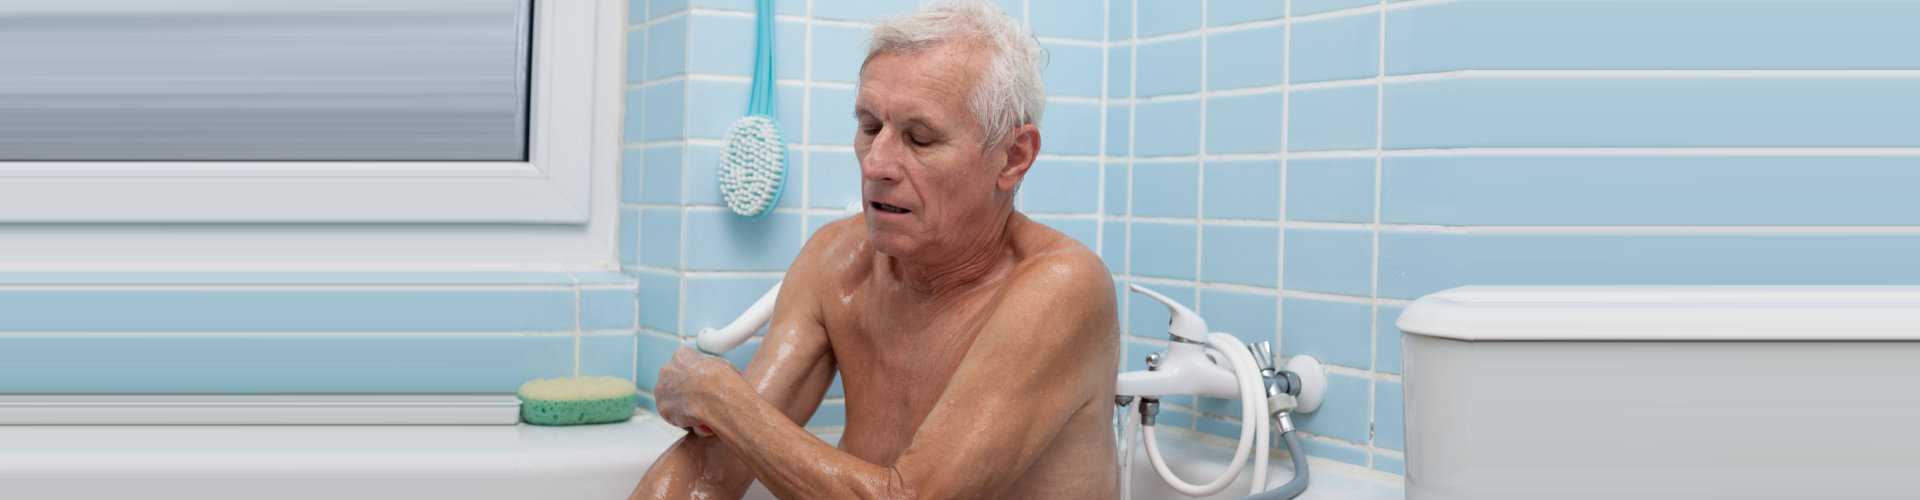 elder man washing his body with soap sponge in bath